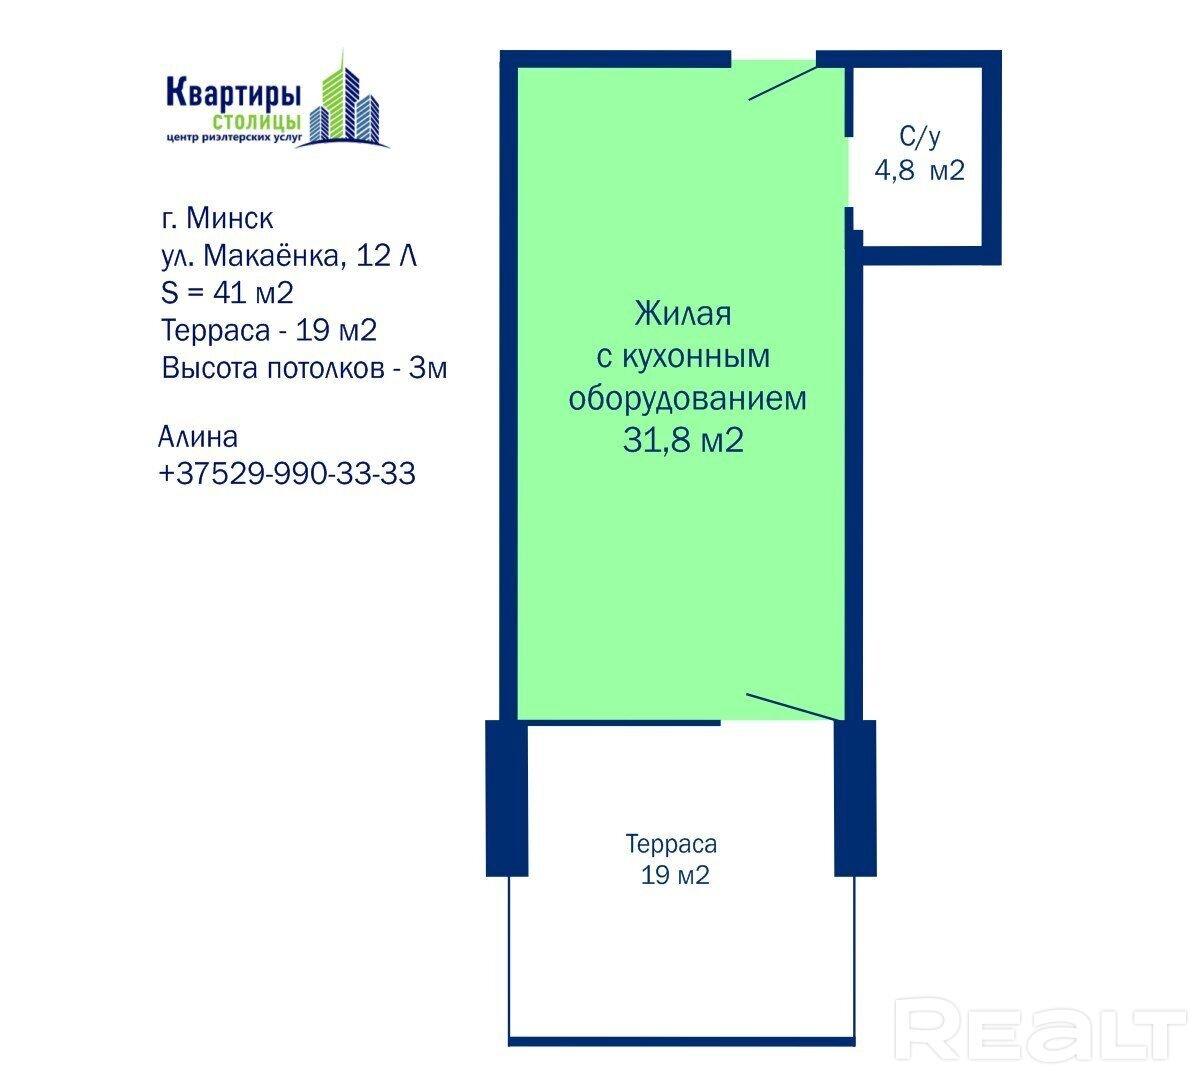 Продажа 1 комнатной квартиры в г. Минске, ул. Макаенка, дом 12-Л (р-н Макаенка). Цена 167 576 руб